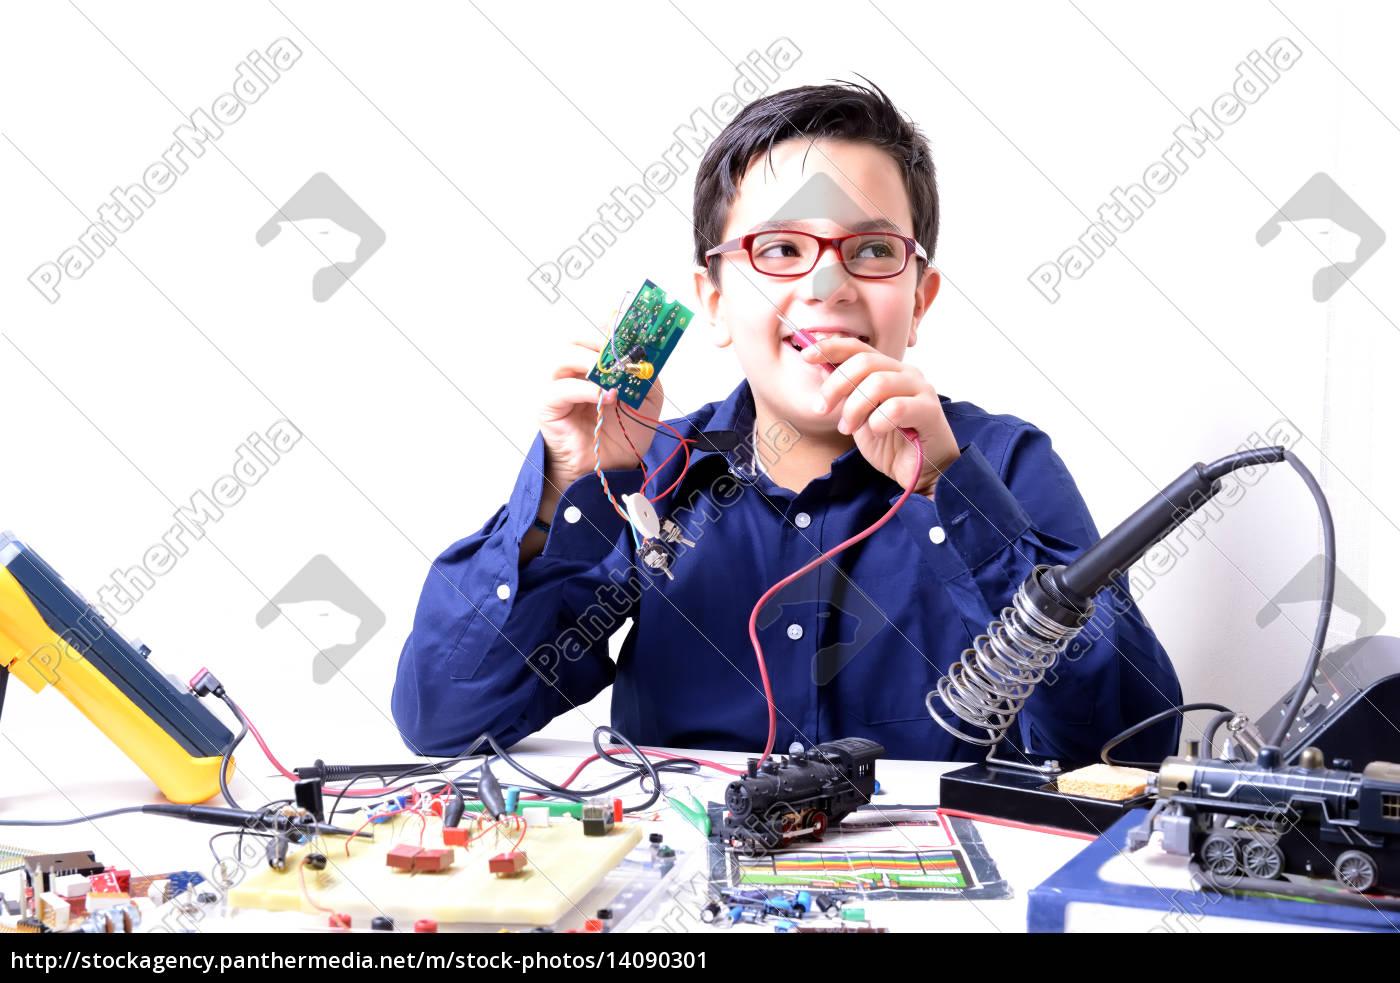 tools, electronics, experiments, student, kid, accomplishment - 14090301